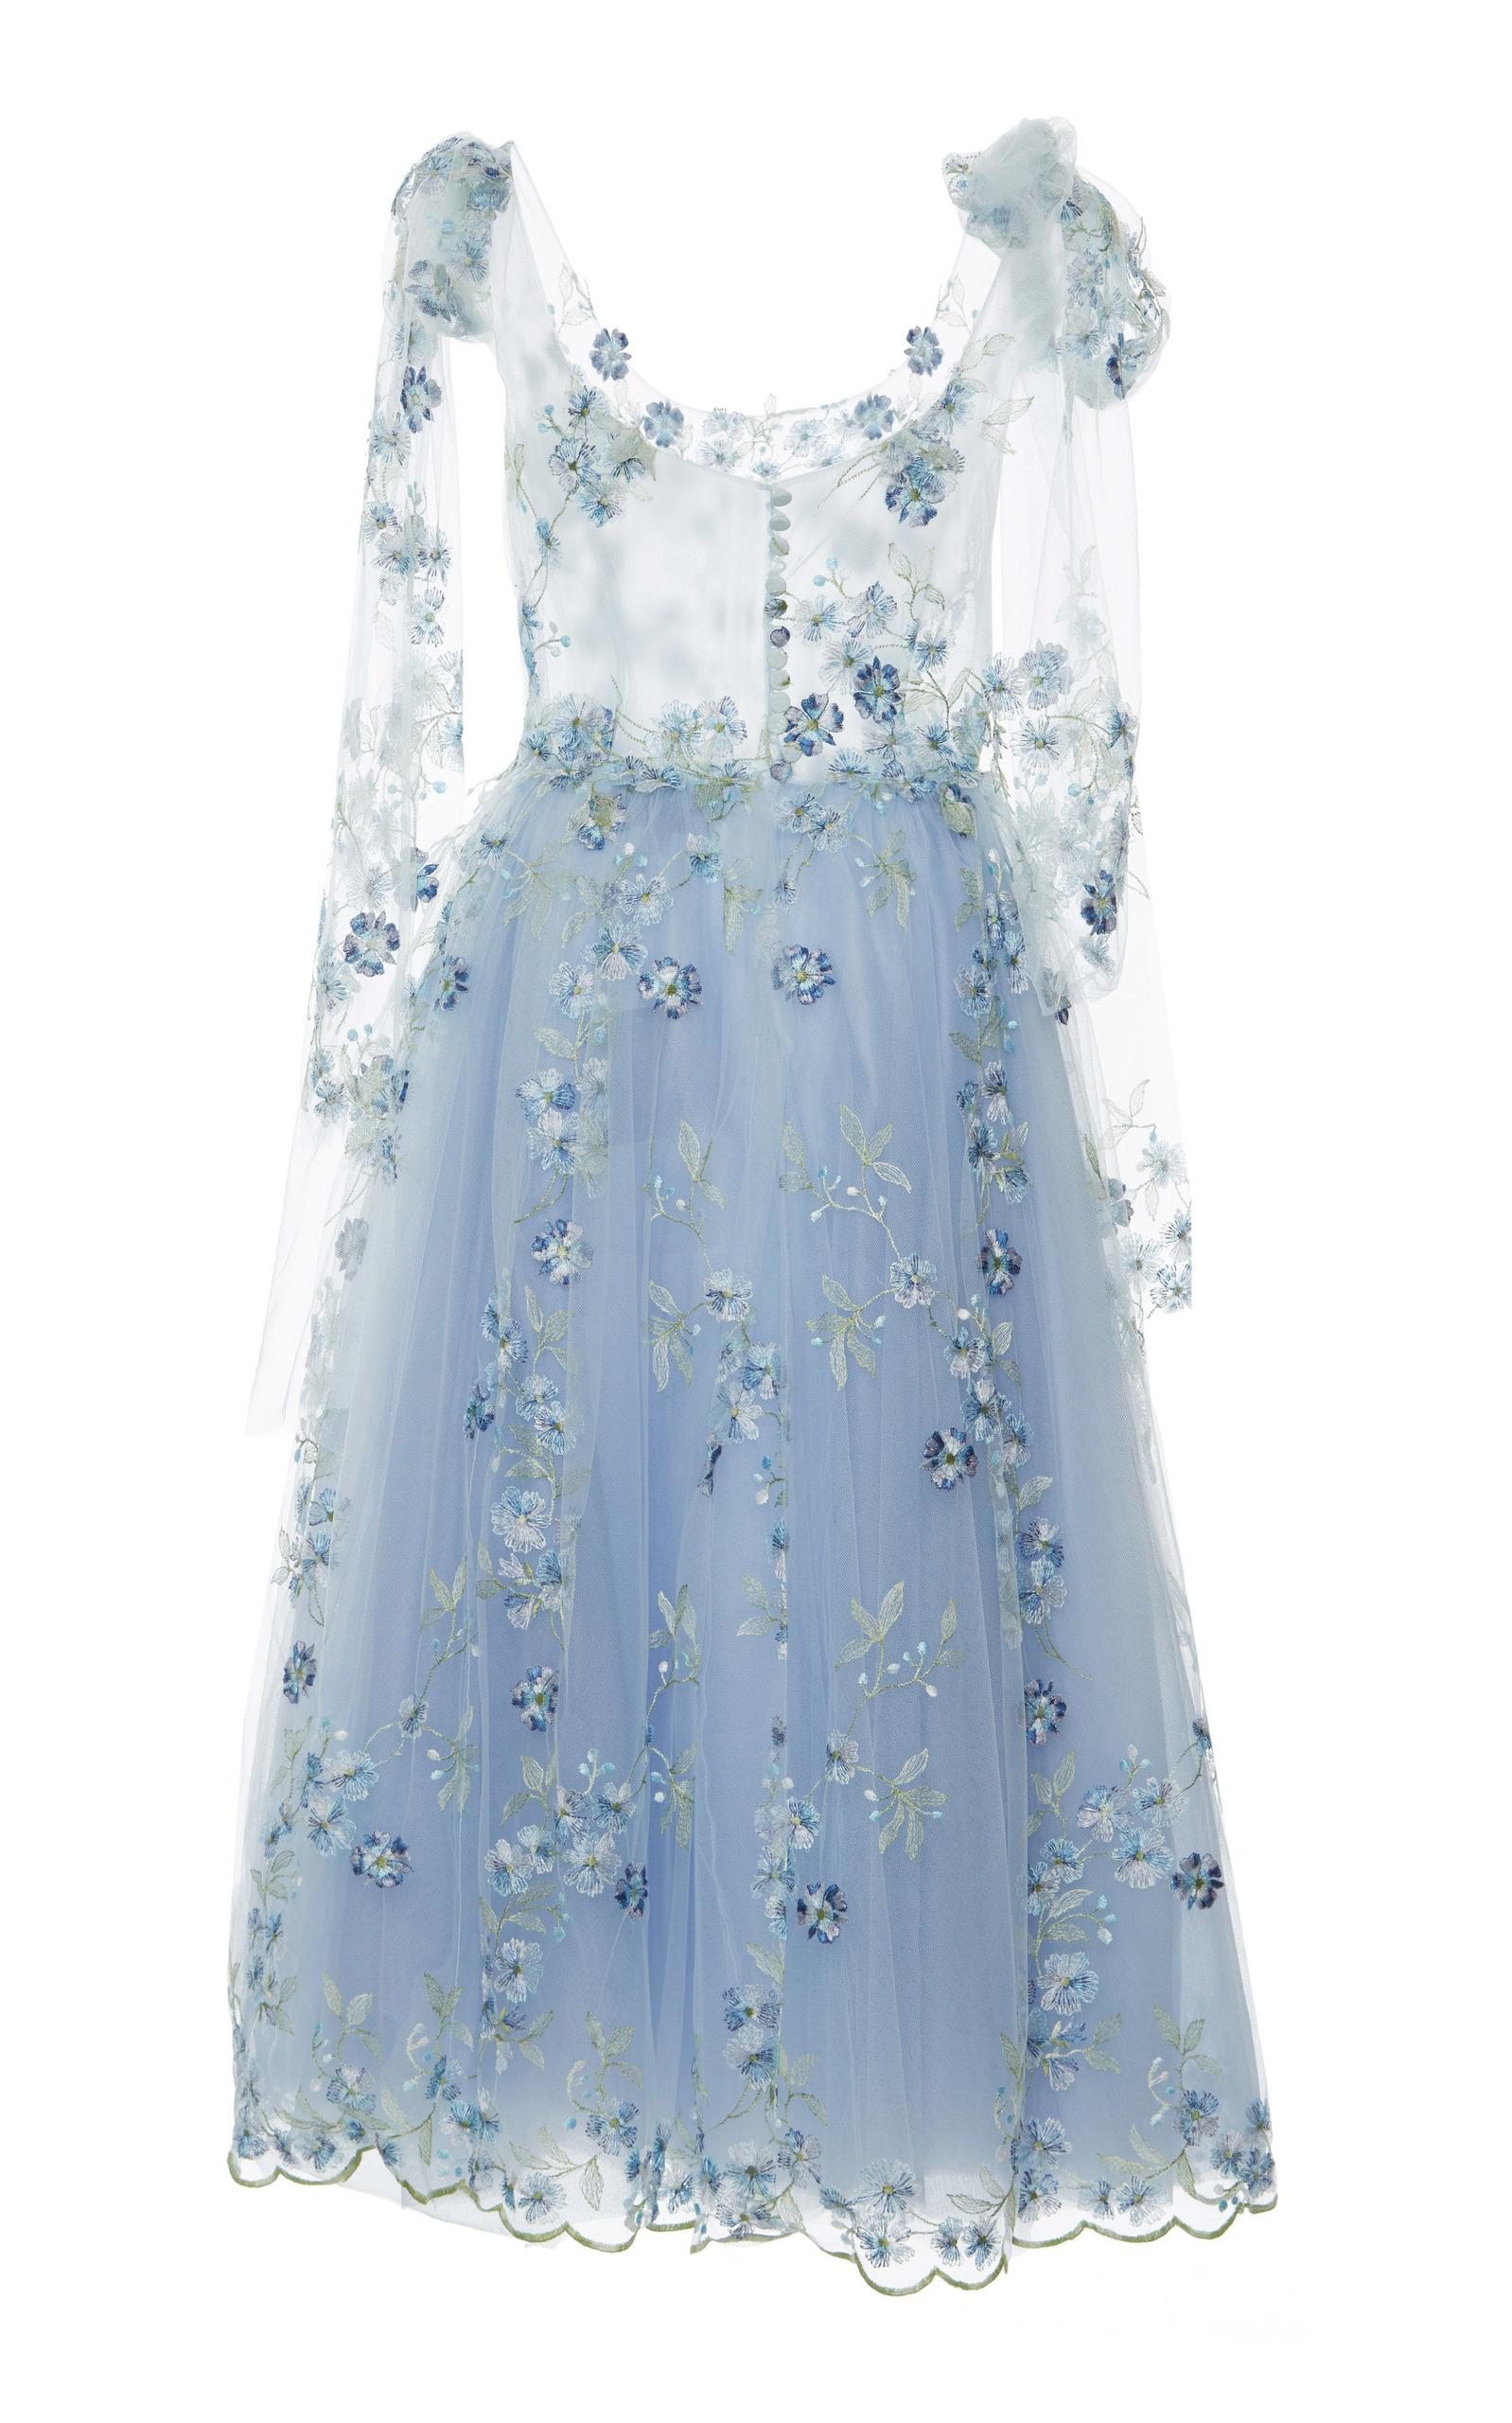 Tulle Embroidered Ballerina Dress by Luisa Beccaria   Moda Operandi